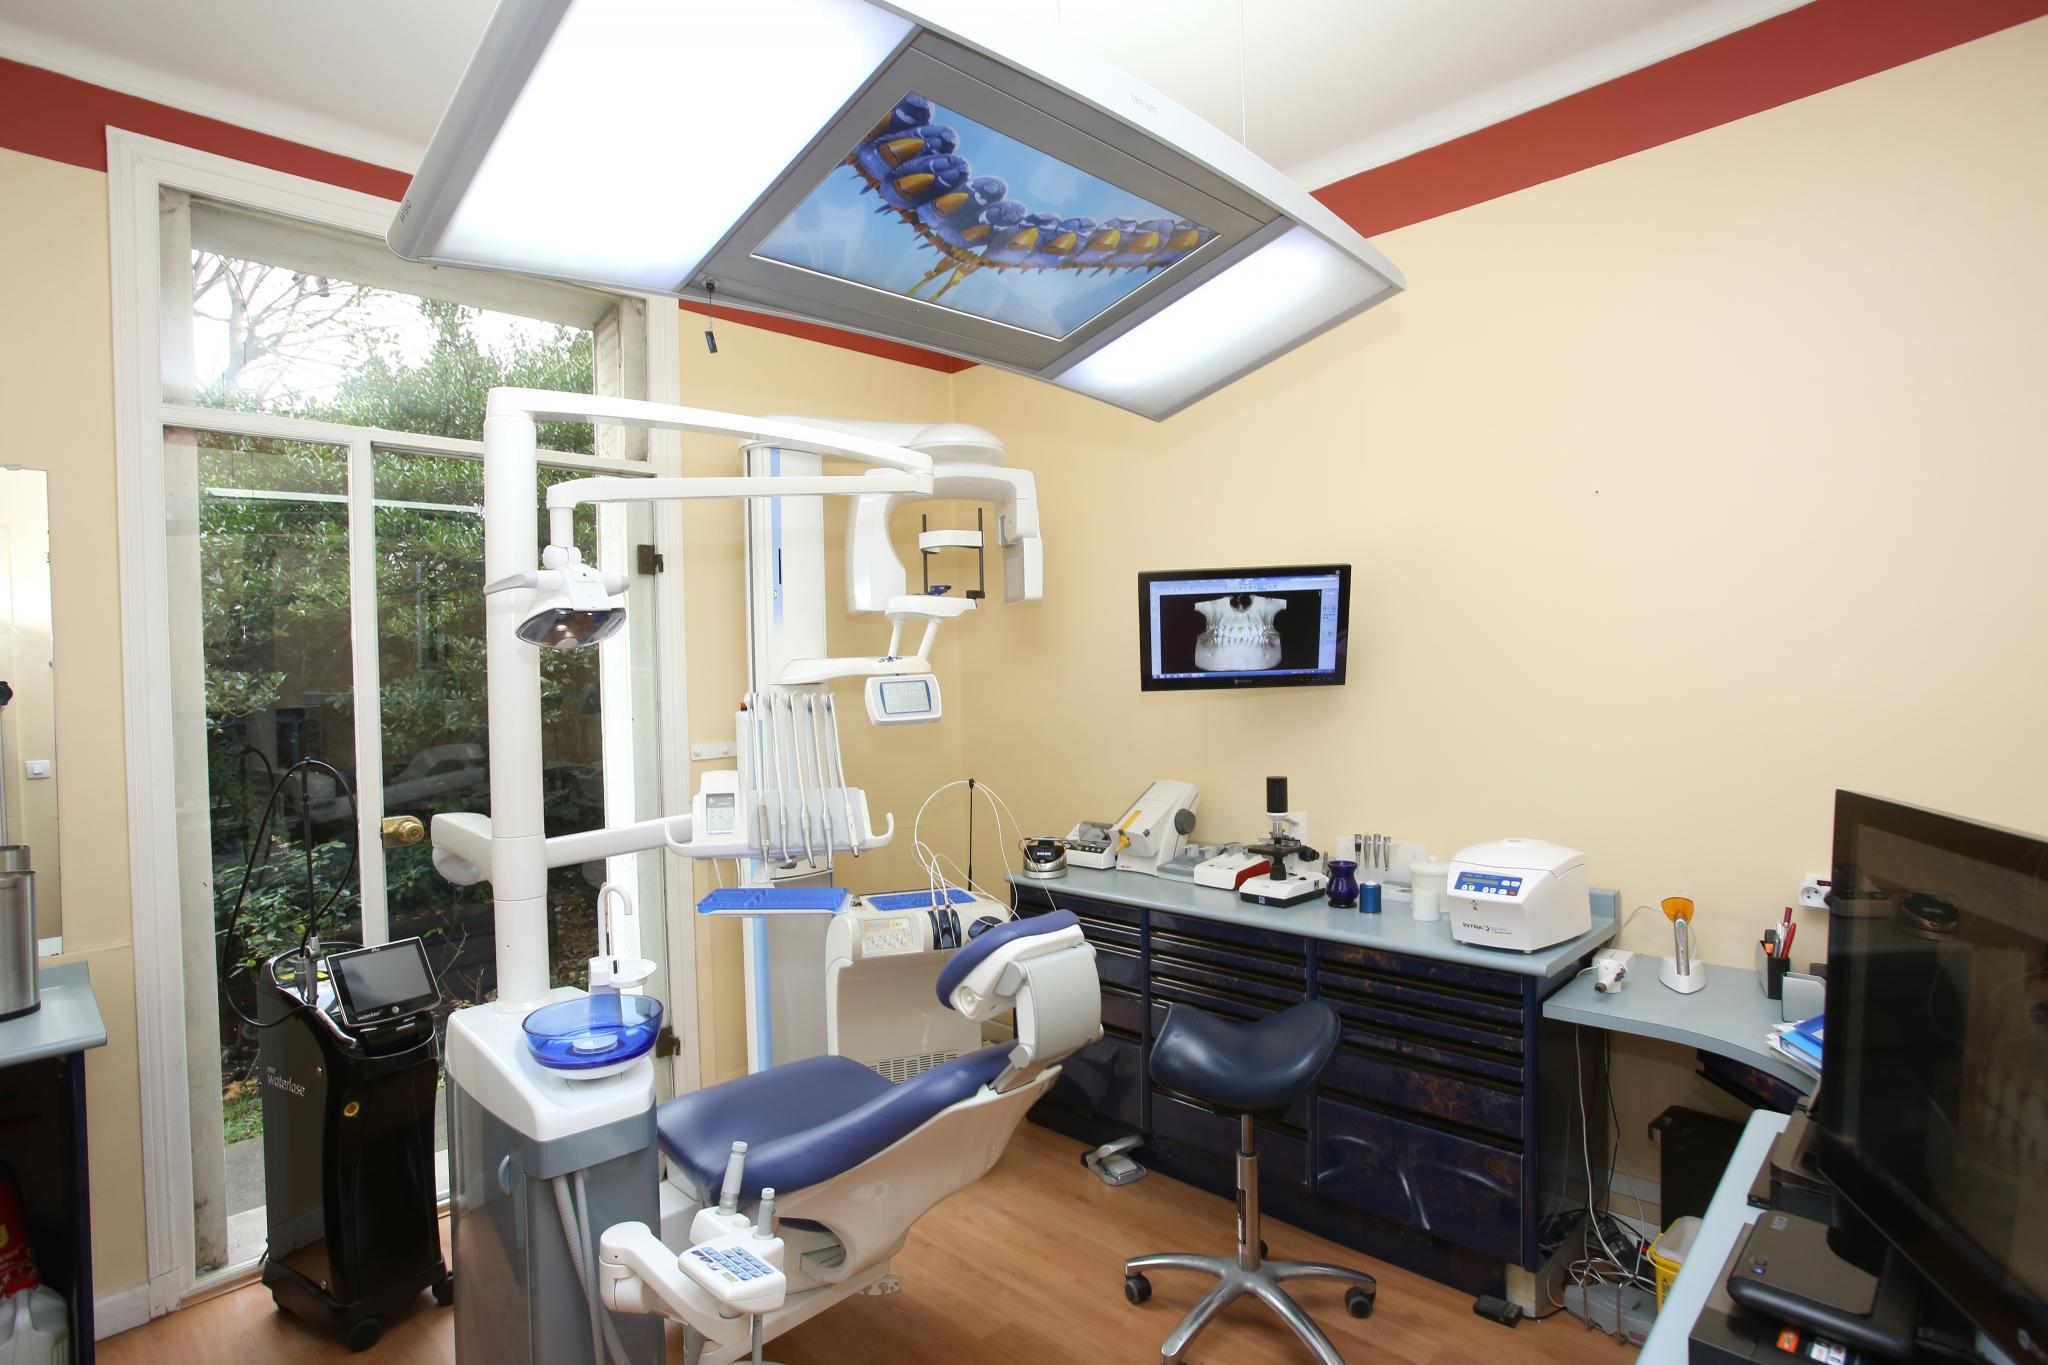 visiter le cabinet dentaire boulogne billancourt 92100 dentiste dr laurent vigneron dr